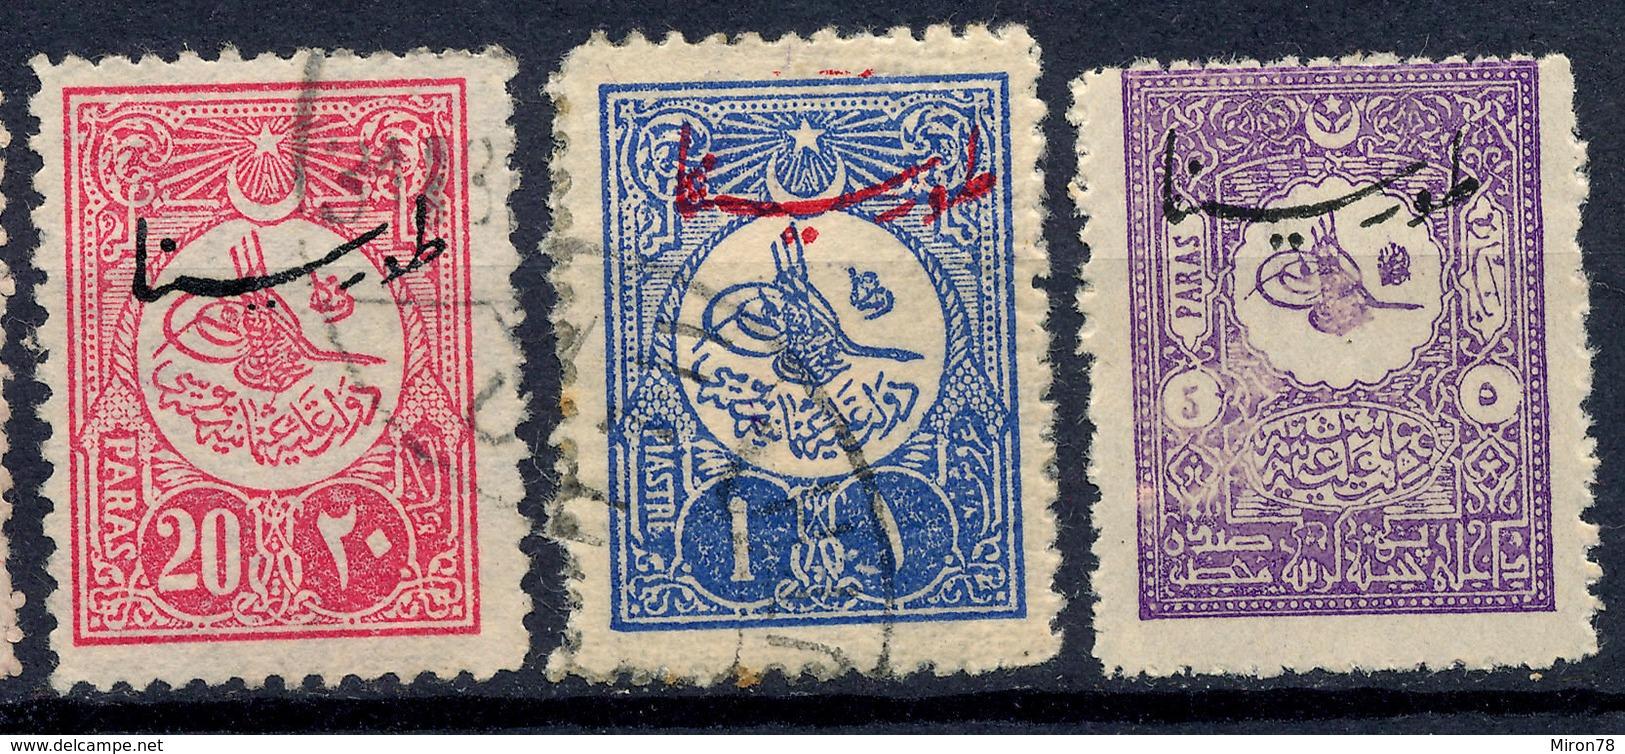 Stamp Turkey  Lot#47 - 1858-1921 Ottoman Empire